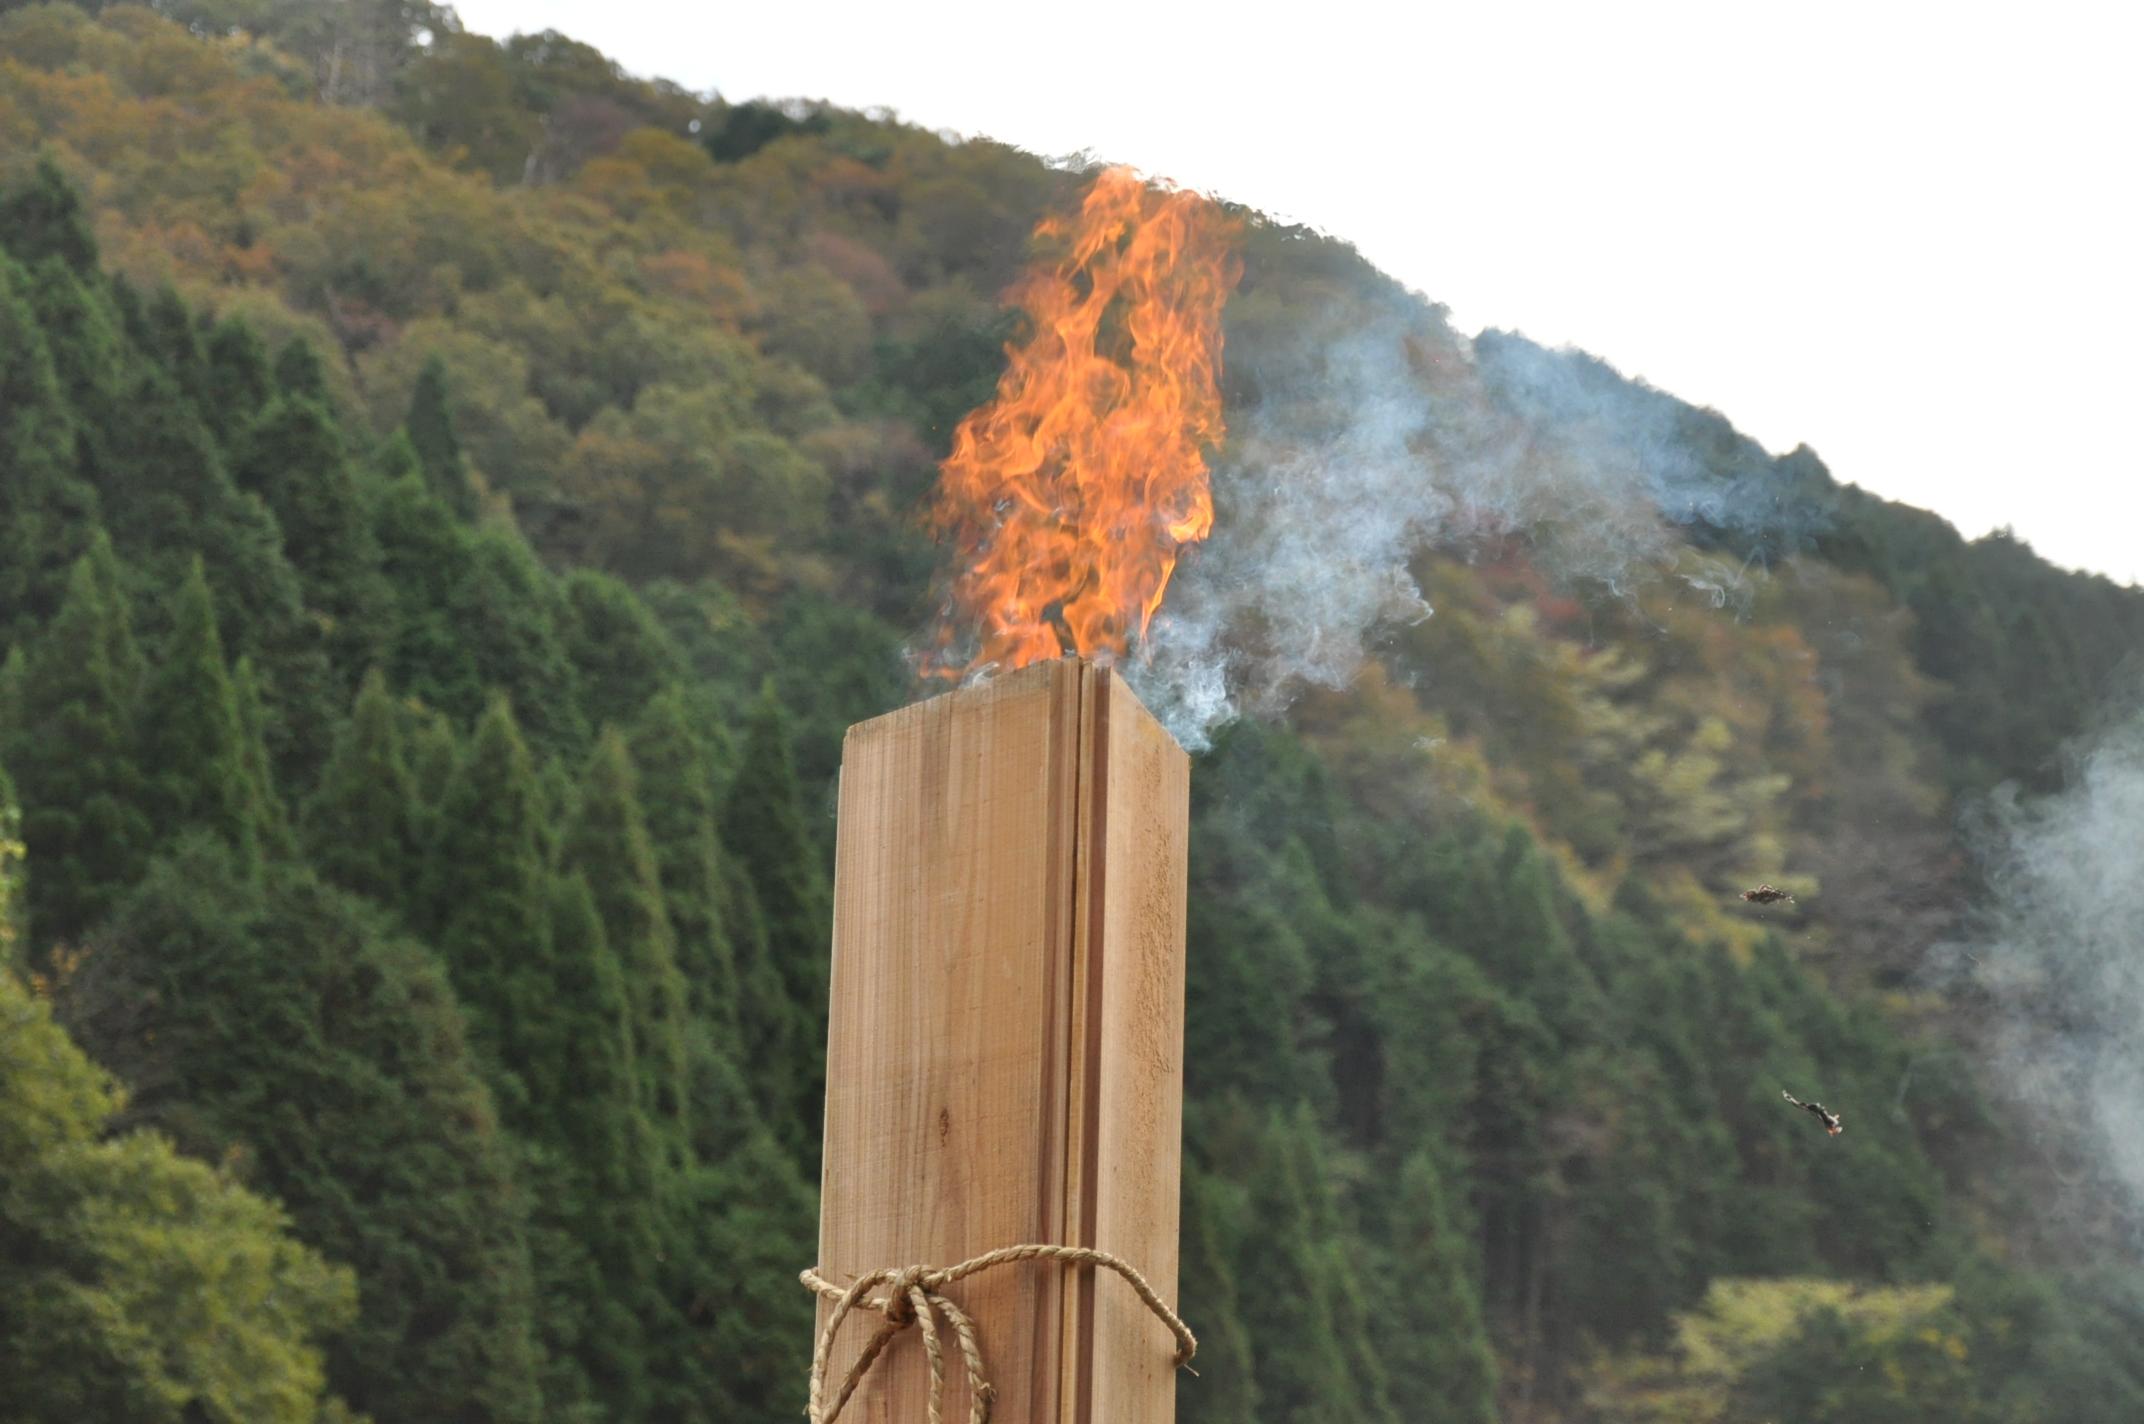 築200年の古民家、焼杉板を焼く!!|古民家再生DIY|火柱